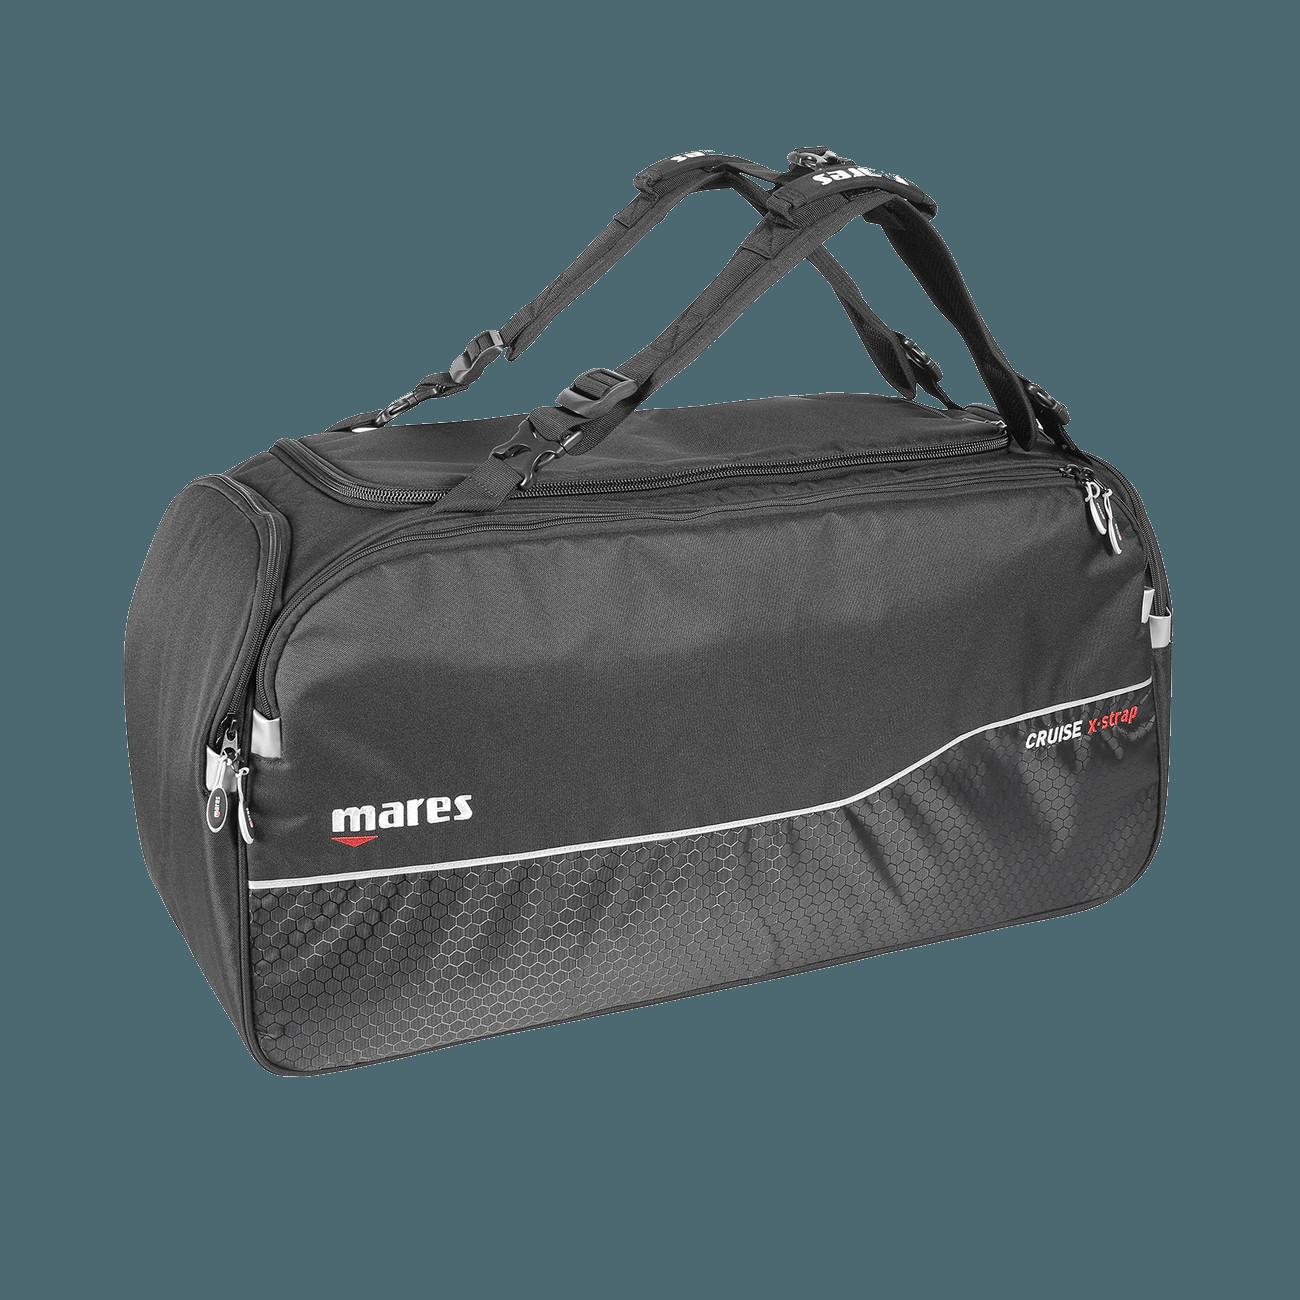 Mares Cruise X Strap Bag | Mares Bags | Mares Singapore